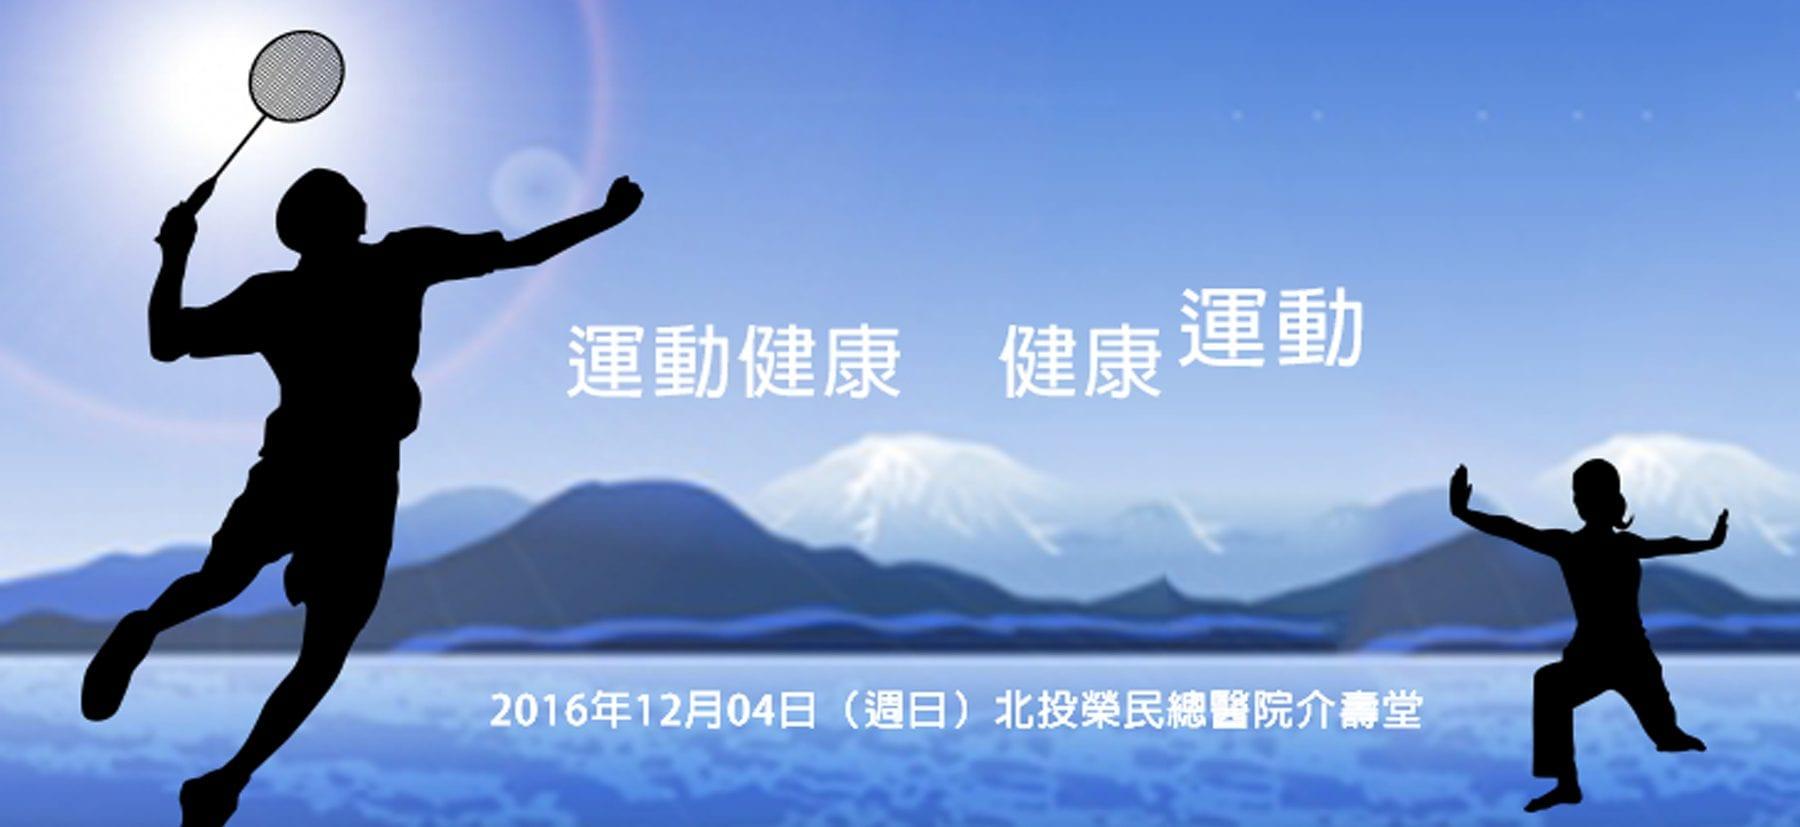 event-20161204